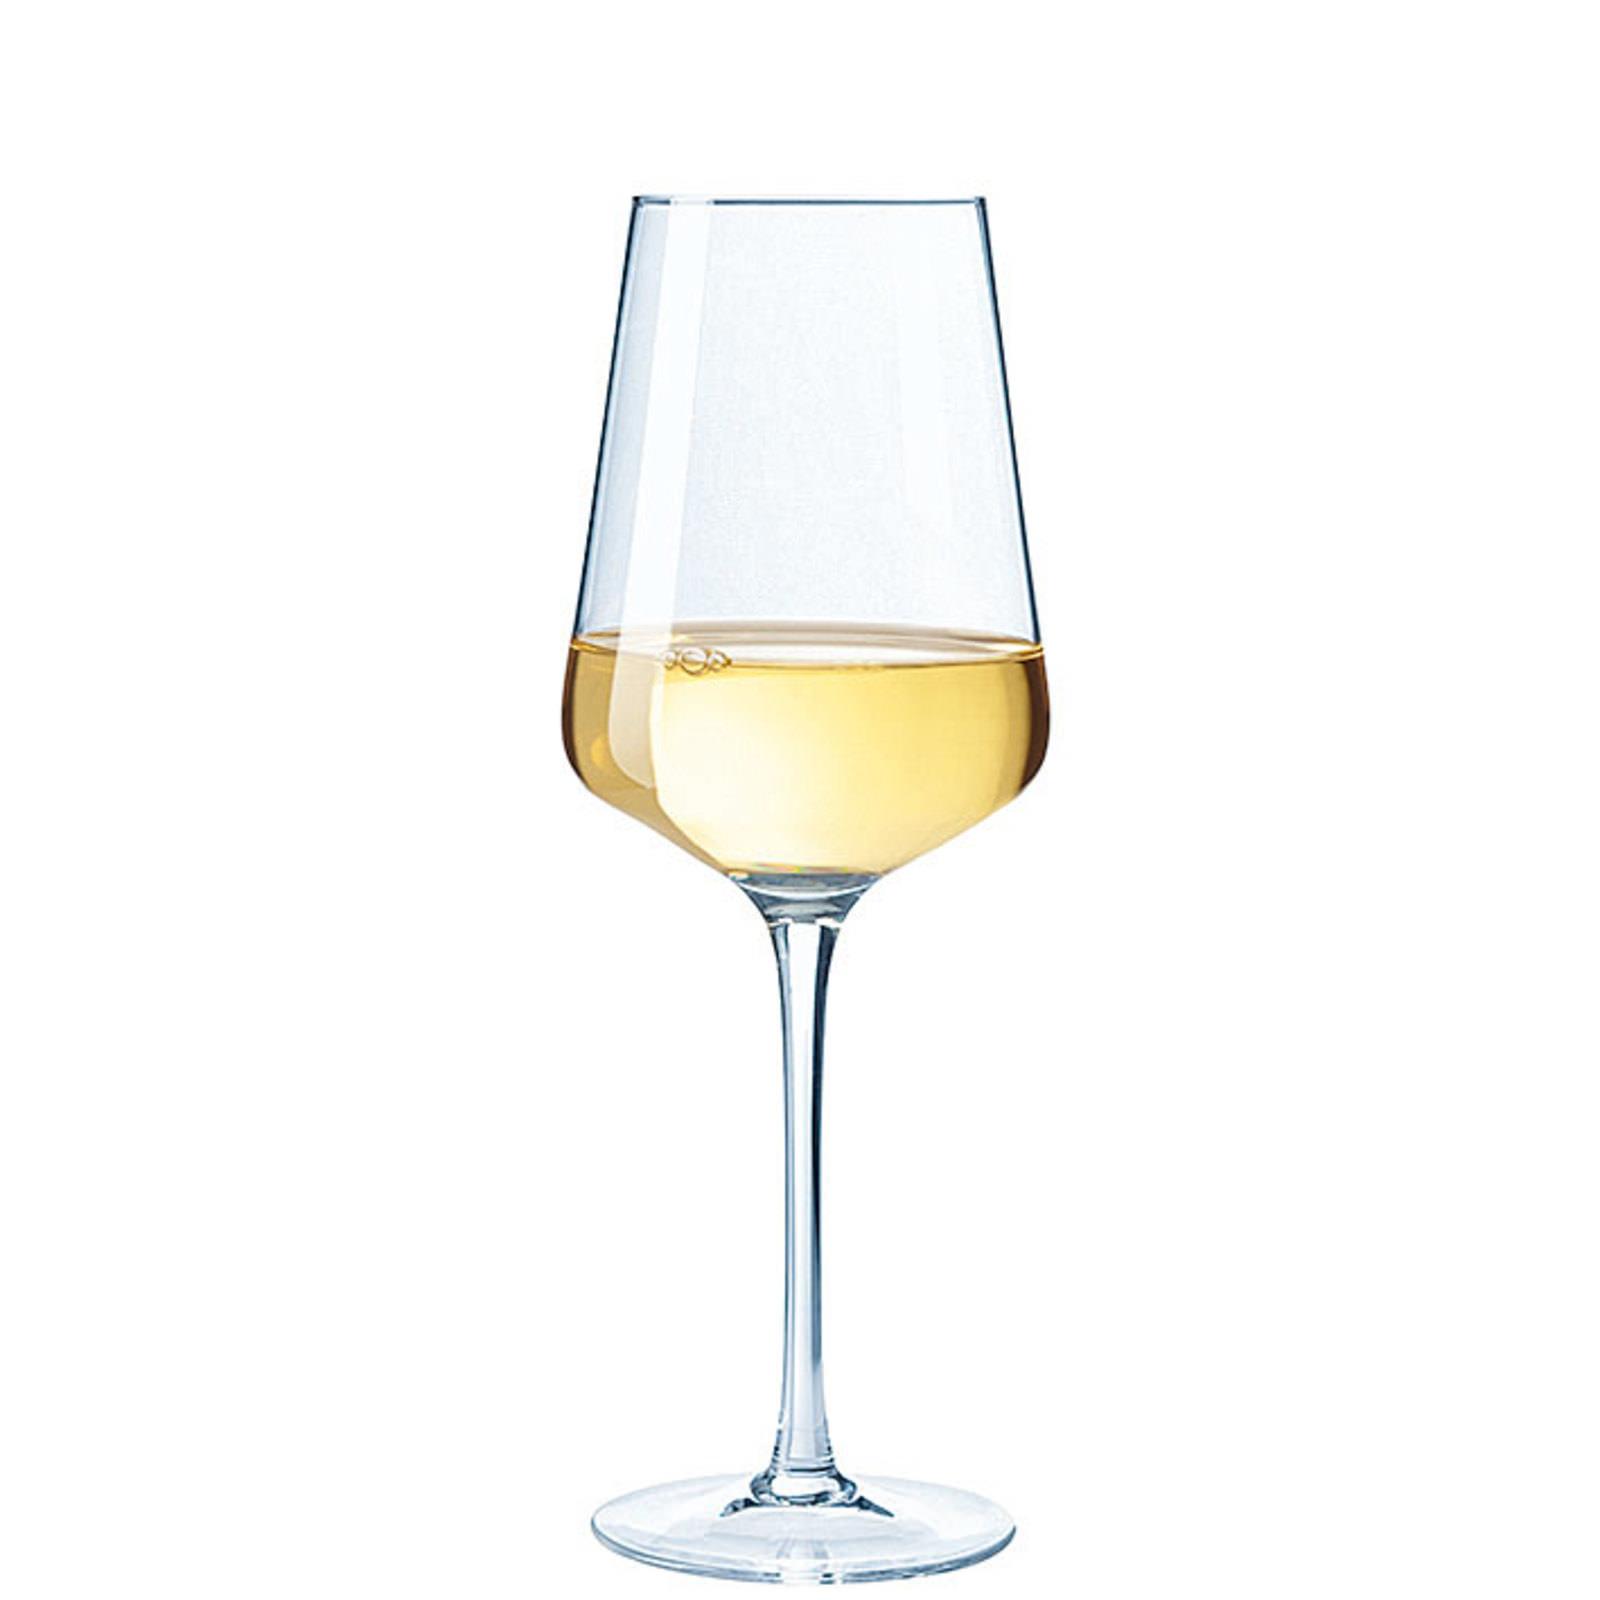 Weisweinglas